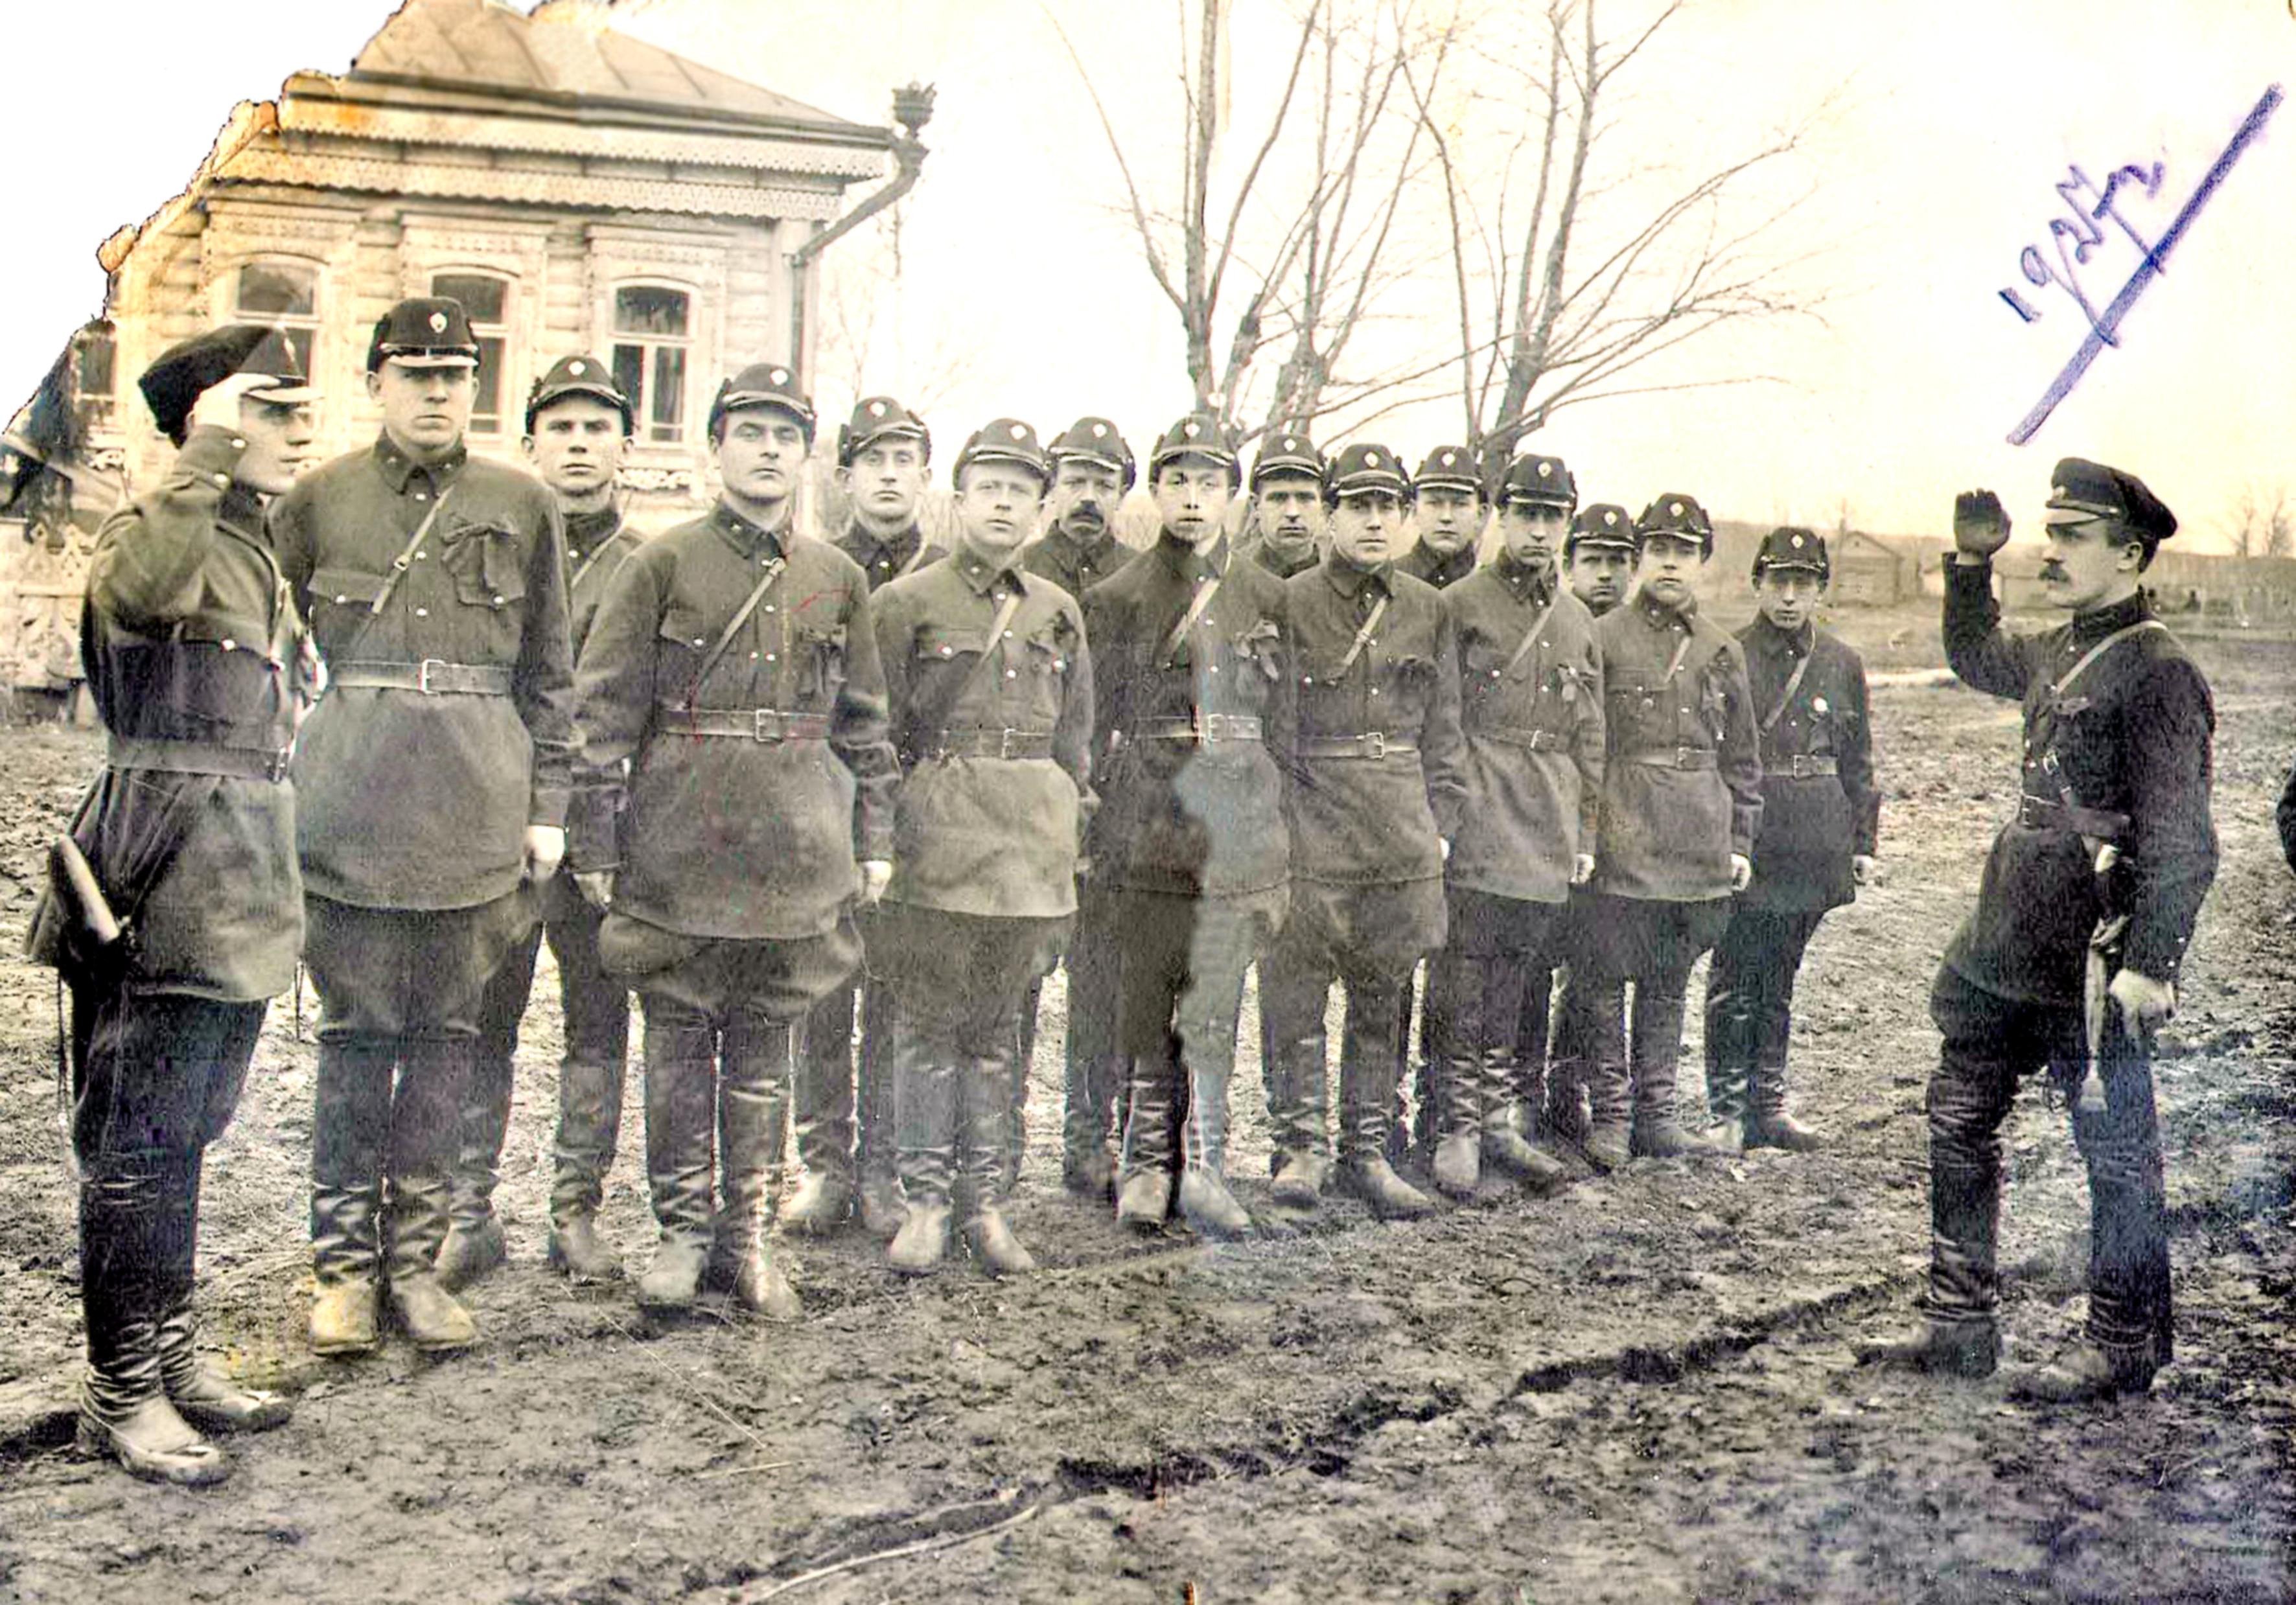 sotrudniki-rkm-poselka-serebryanye-prudy-moskovskojj-oblasti-1927-g.jpg